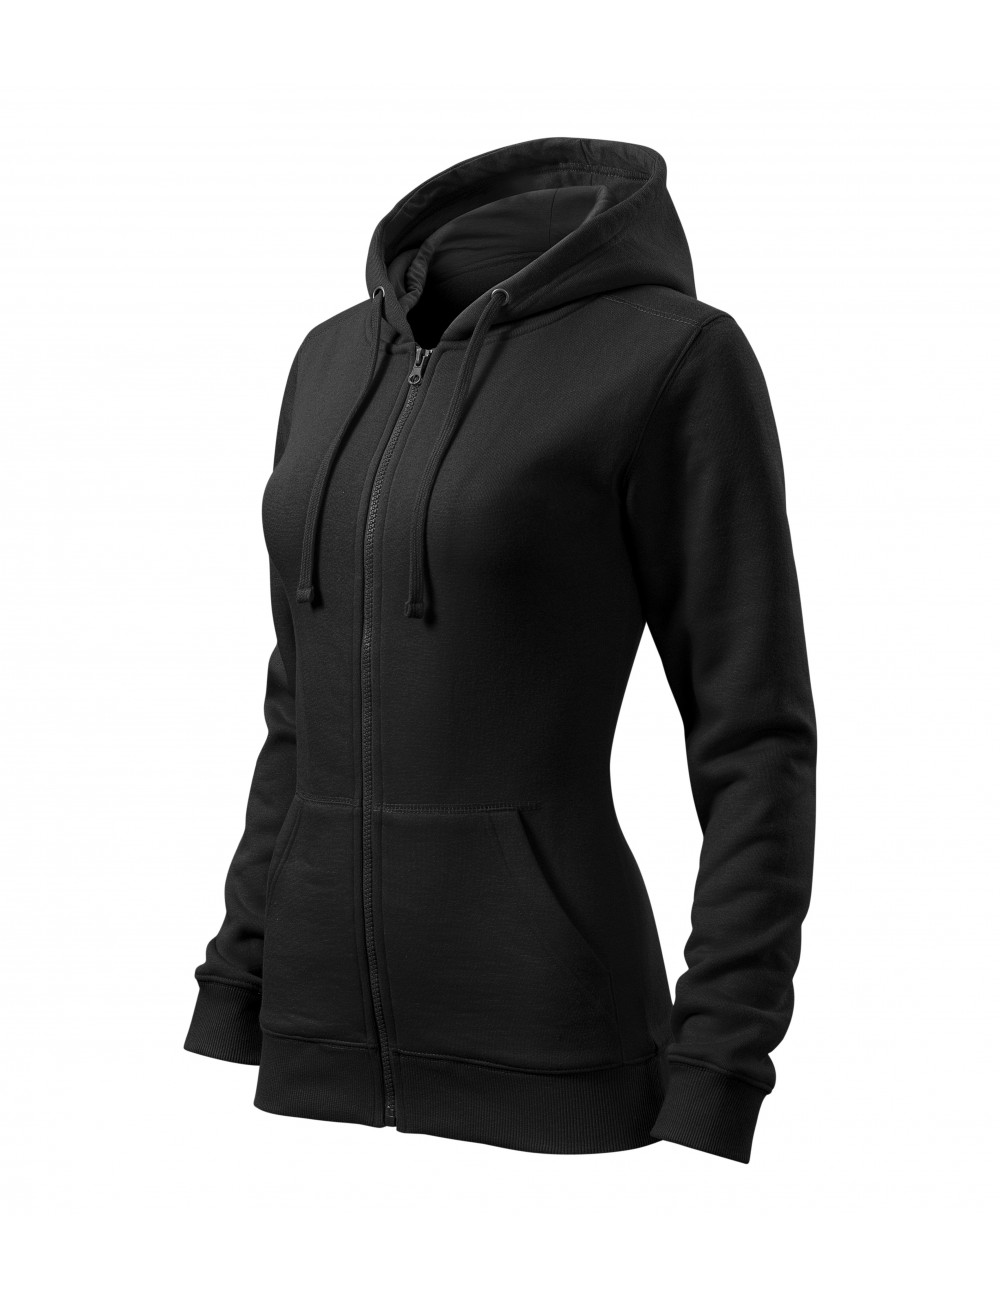 Adler MALFINI Bluza damska Trendy Zipper 411 czarny